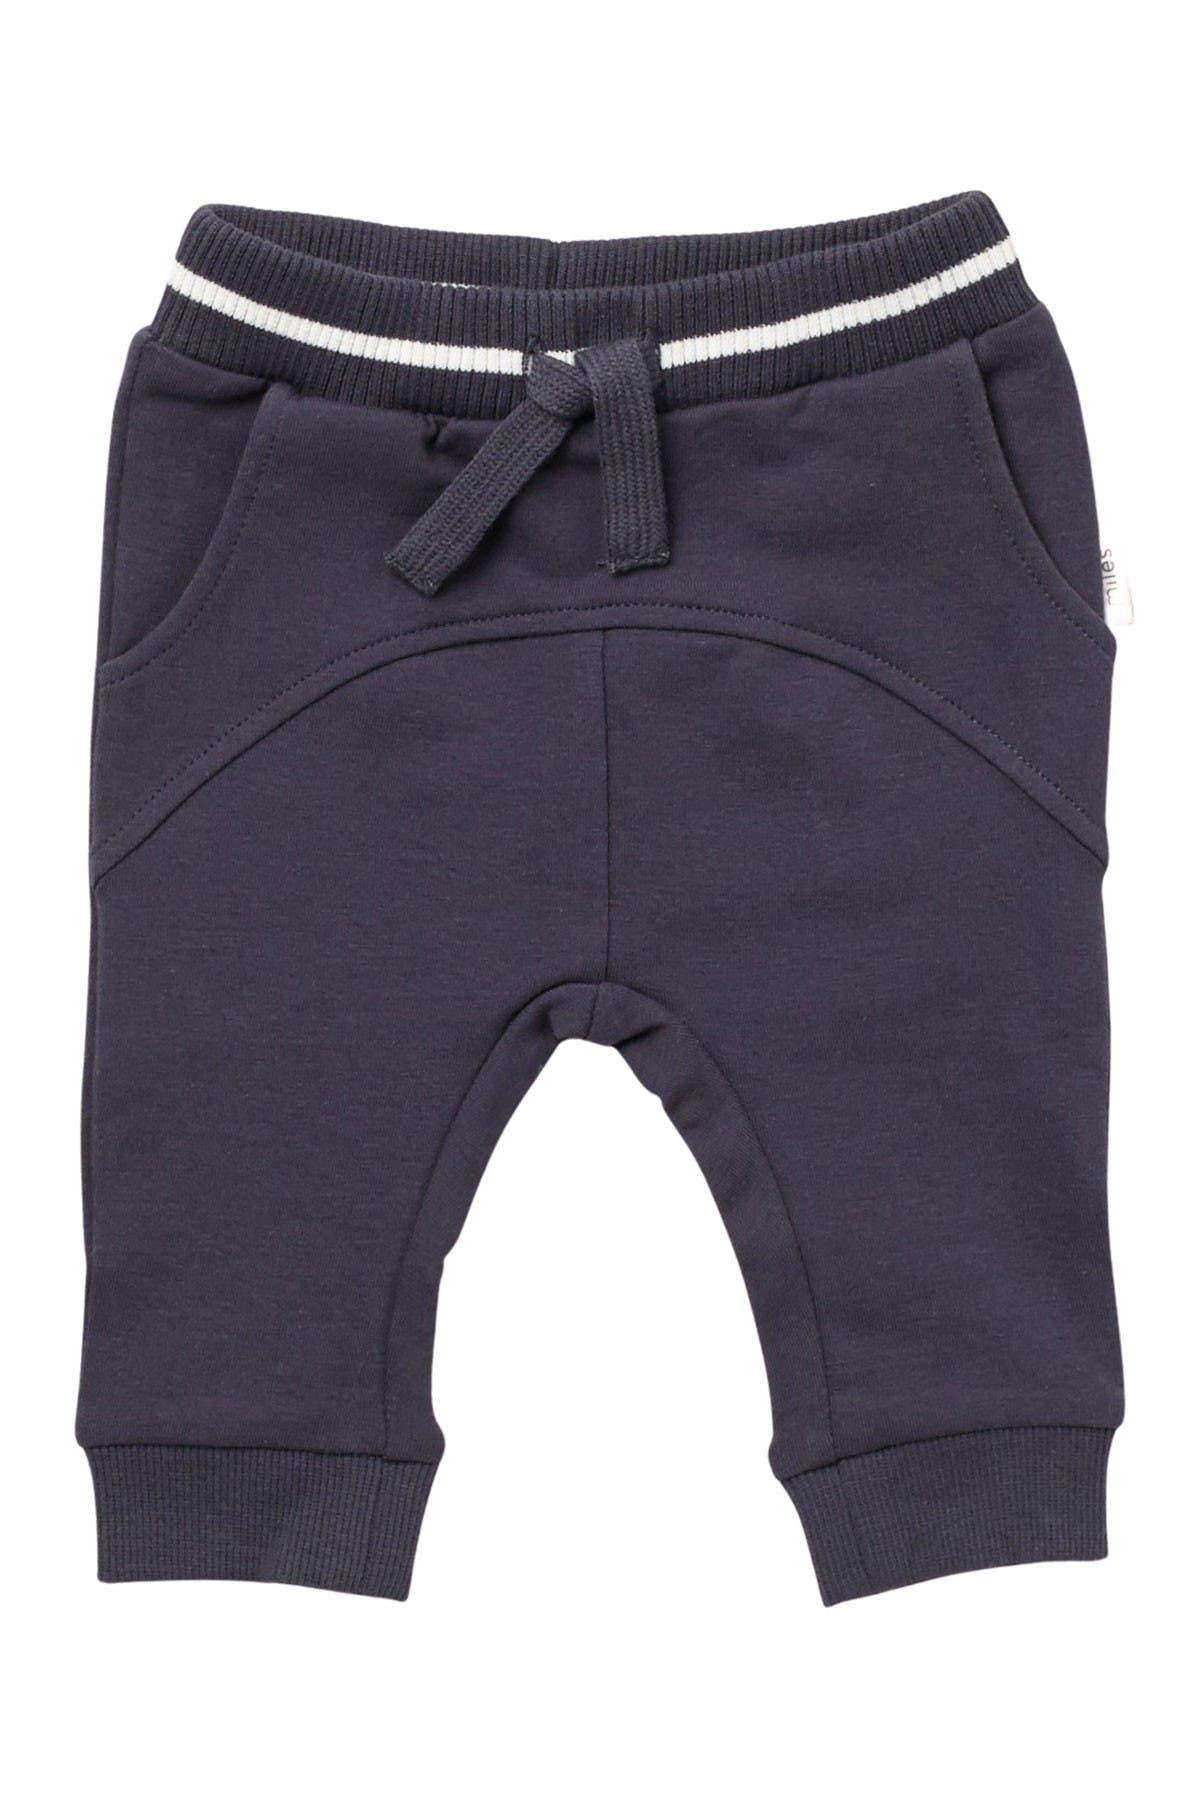 Image of MILES Knit Jogging Pants